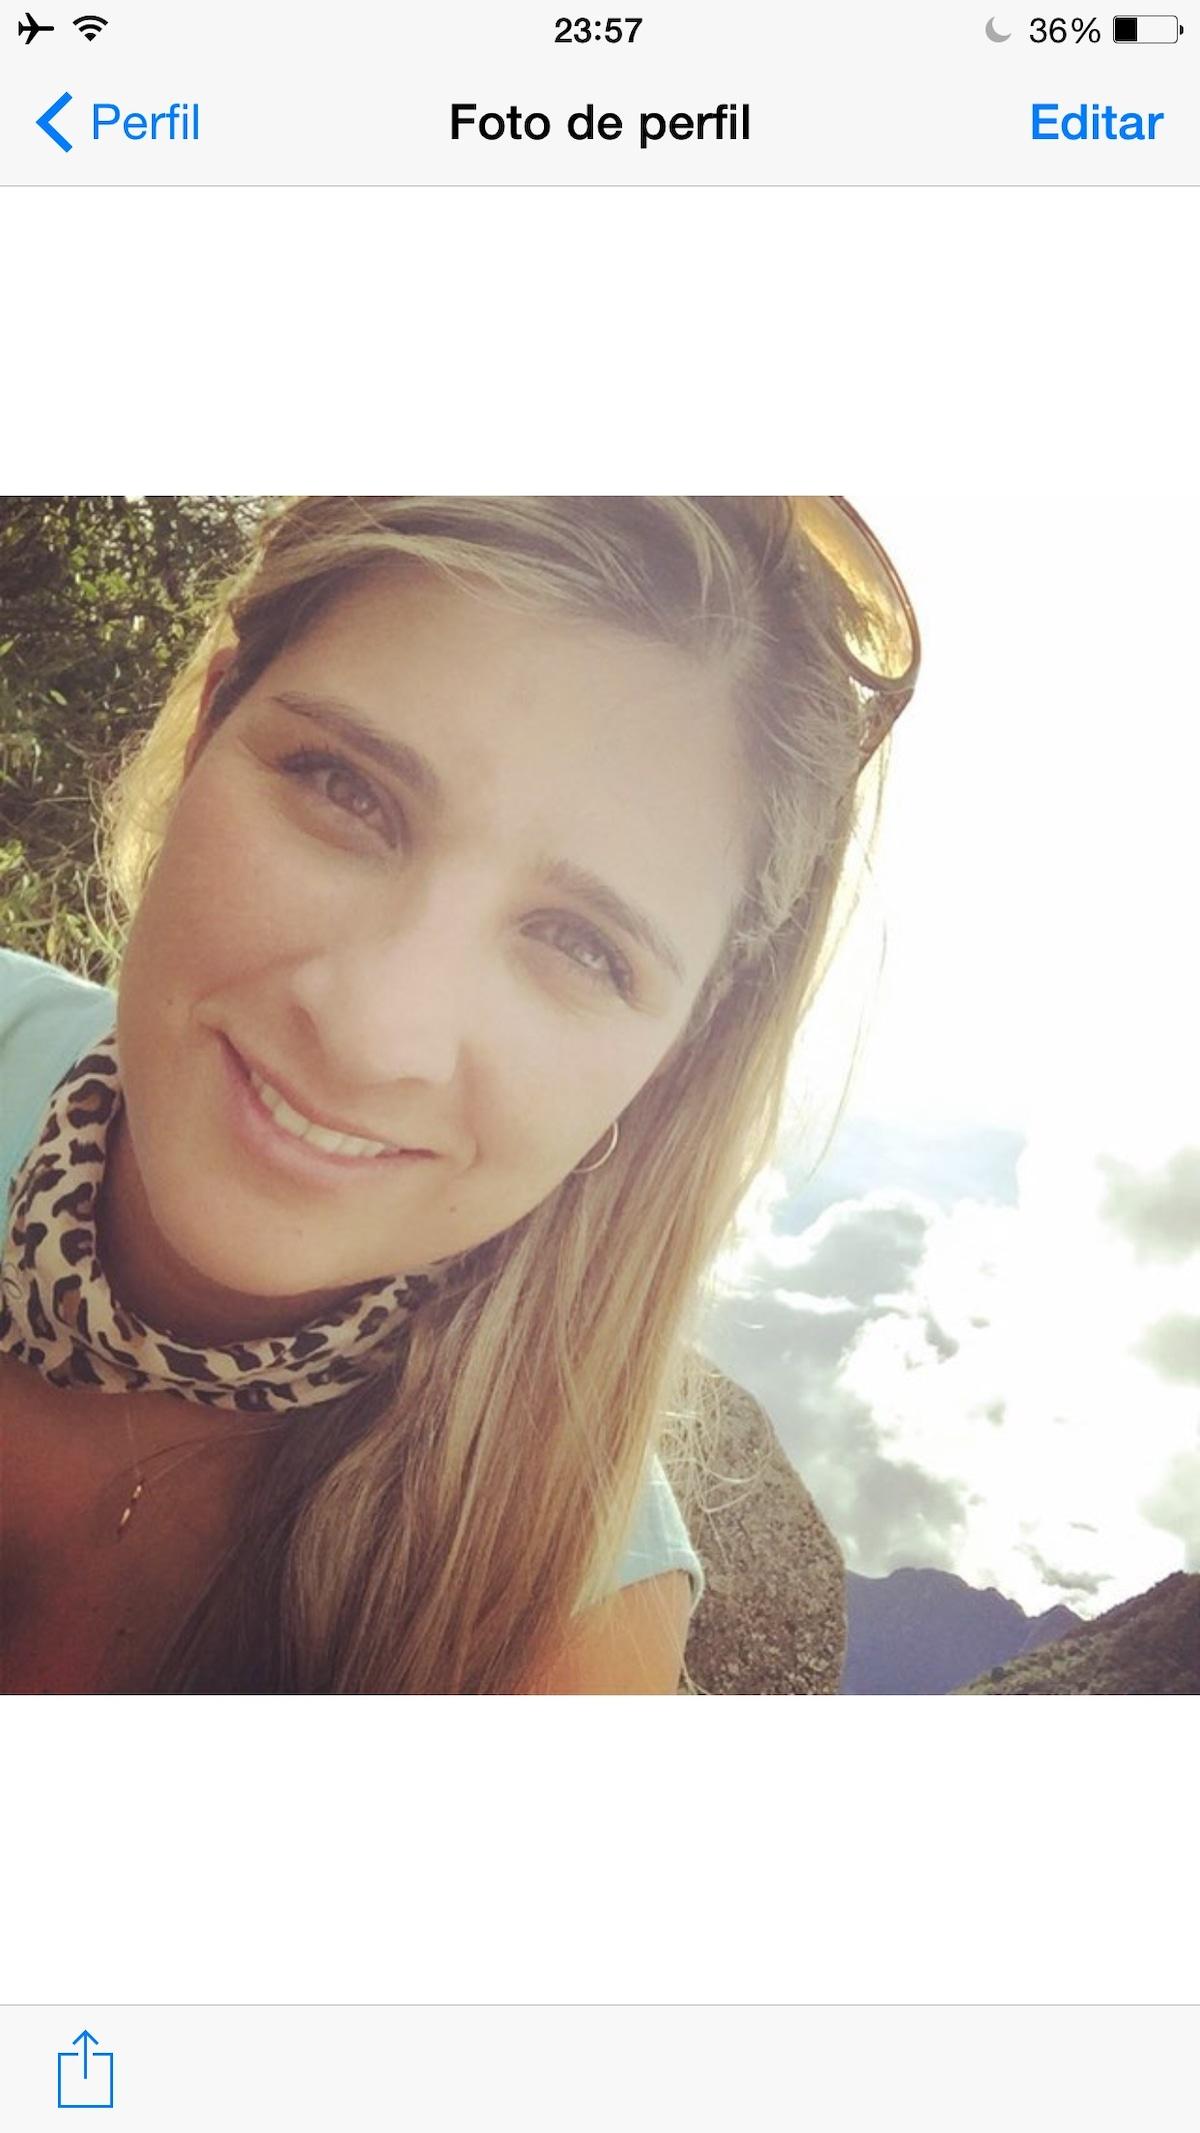 Nathalie From Santiago de Surco, Peru